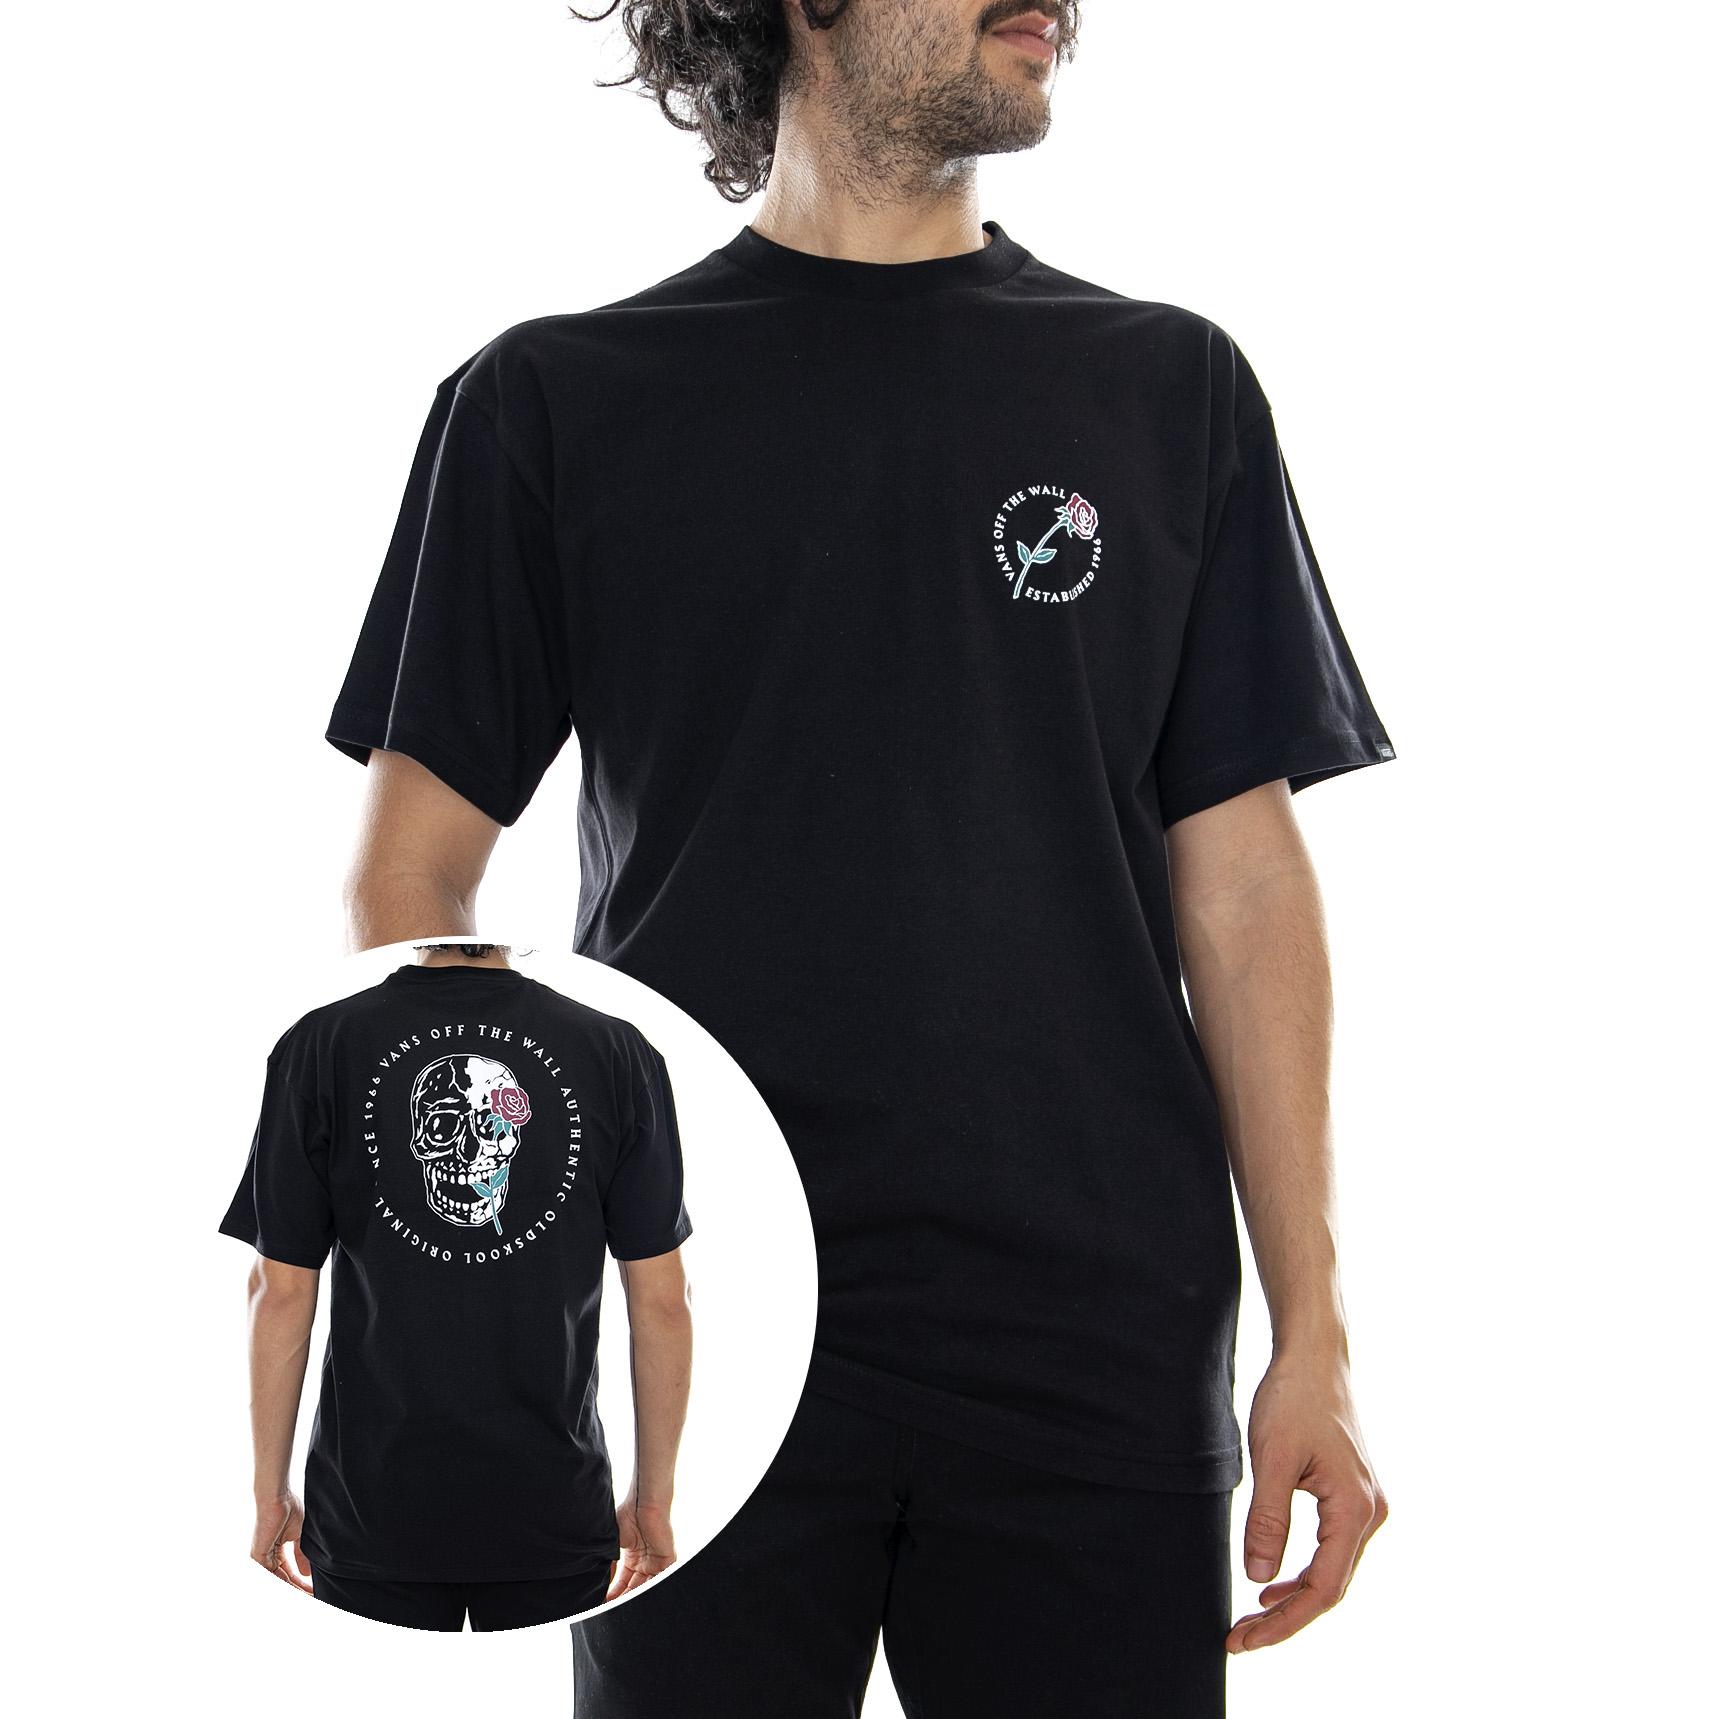 c1980660c Vans Mn Coming Up Roses Black - T-shirt Crew-neck Man's Black | eBay